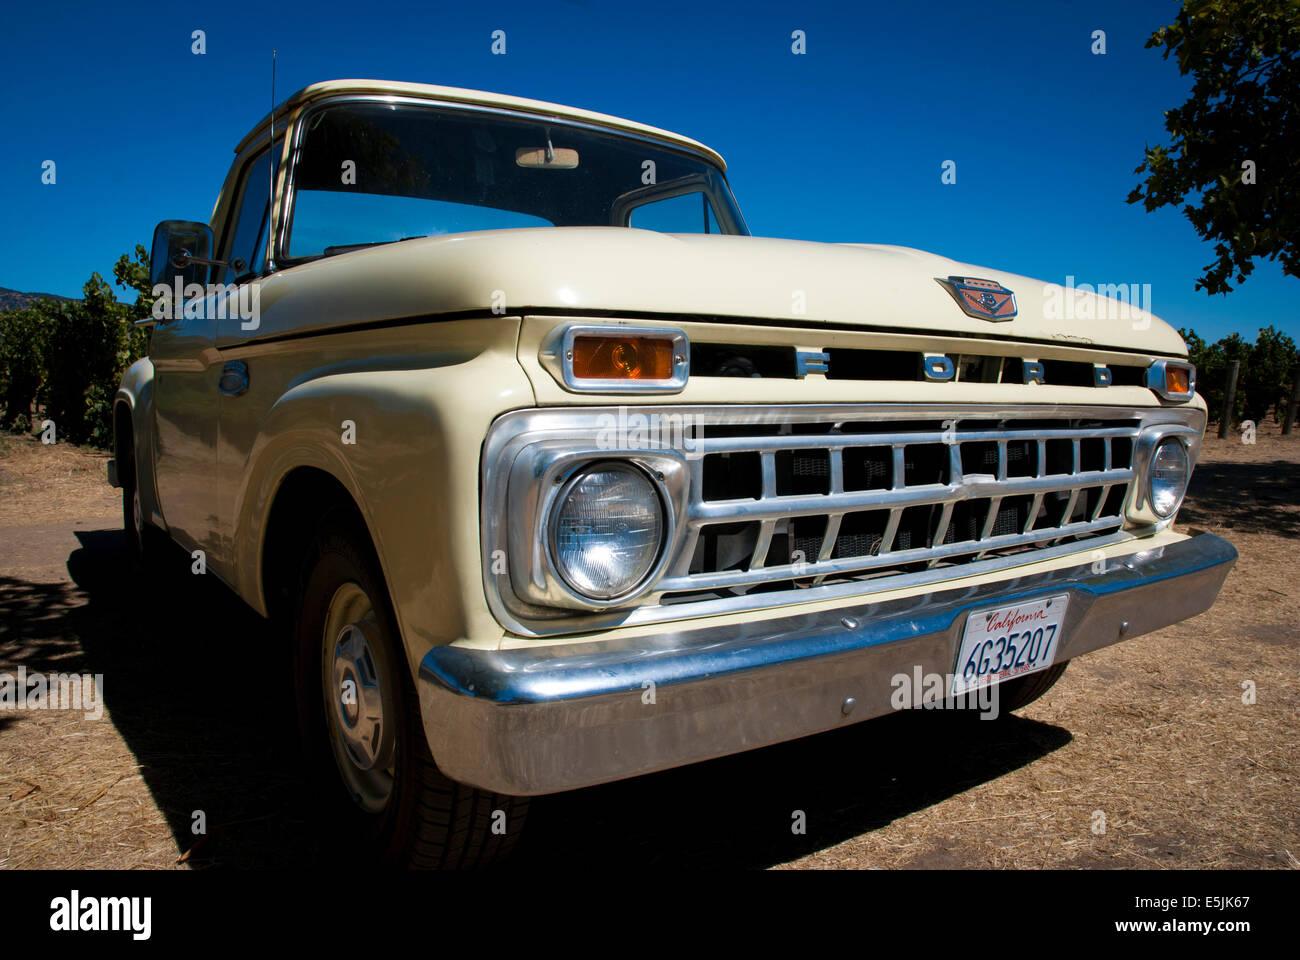 Ford F100 Pickup Truck Stock Photos 1955 Pick Up Napa Valley California Usa Image